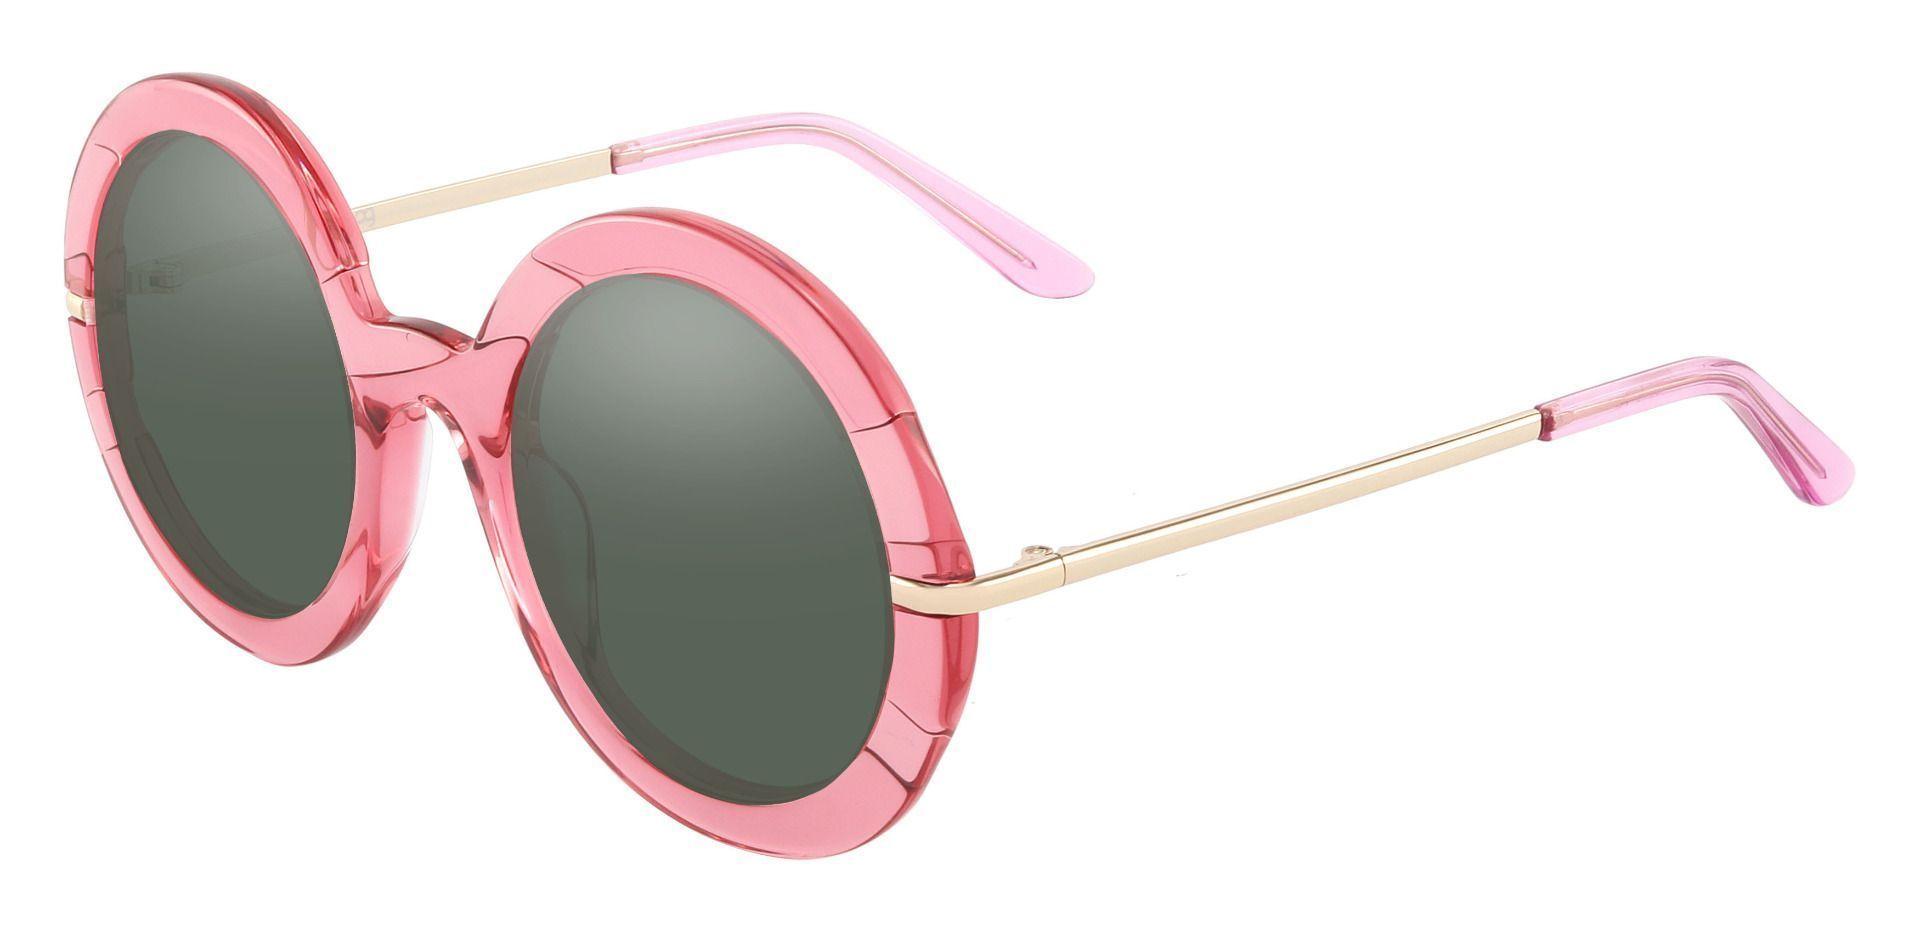 Pristine Round Prescription Sunglasses - Pink Frame With Green Lenses